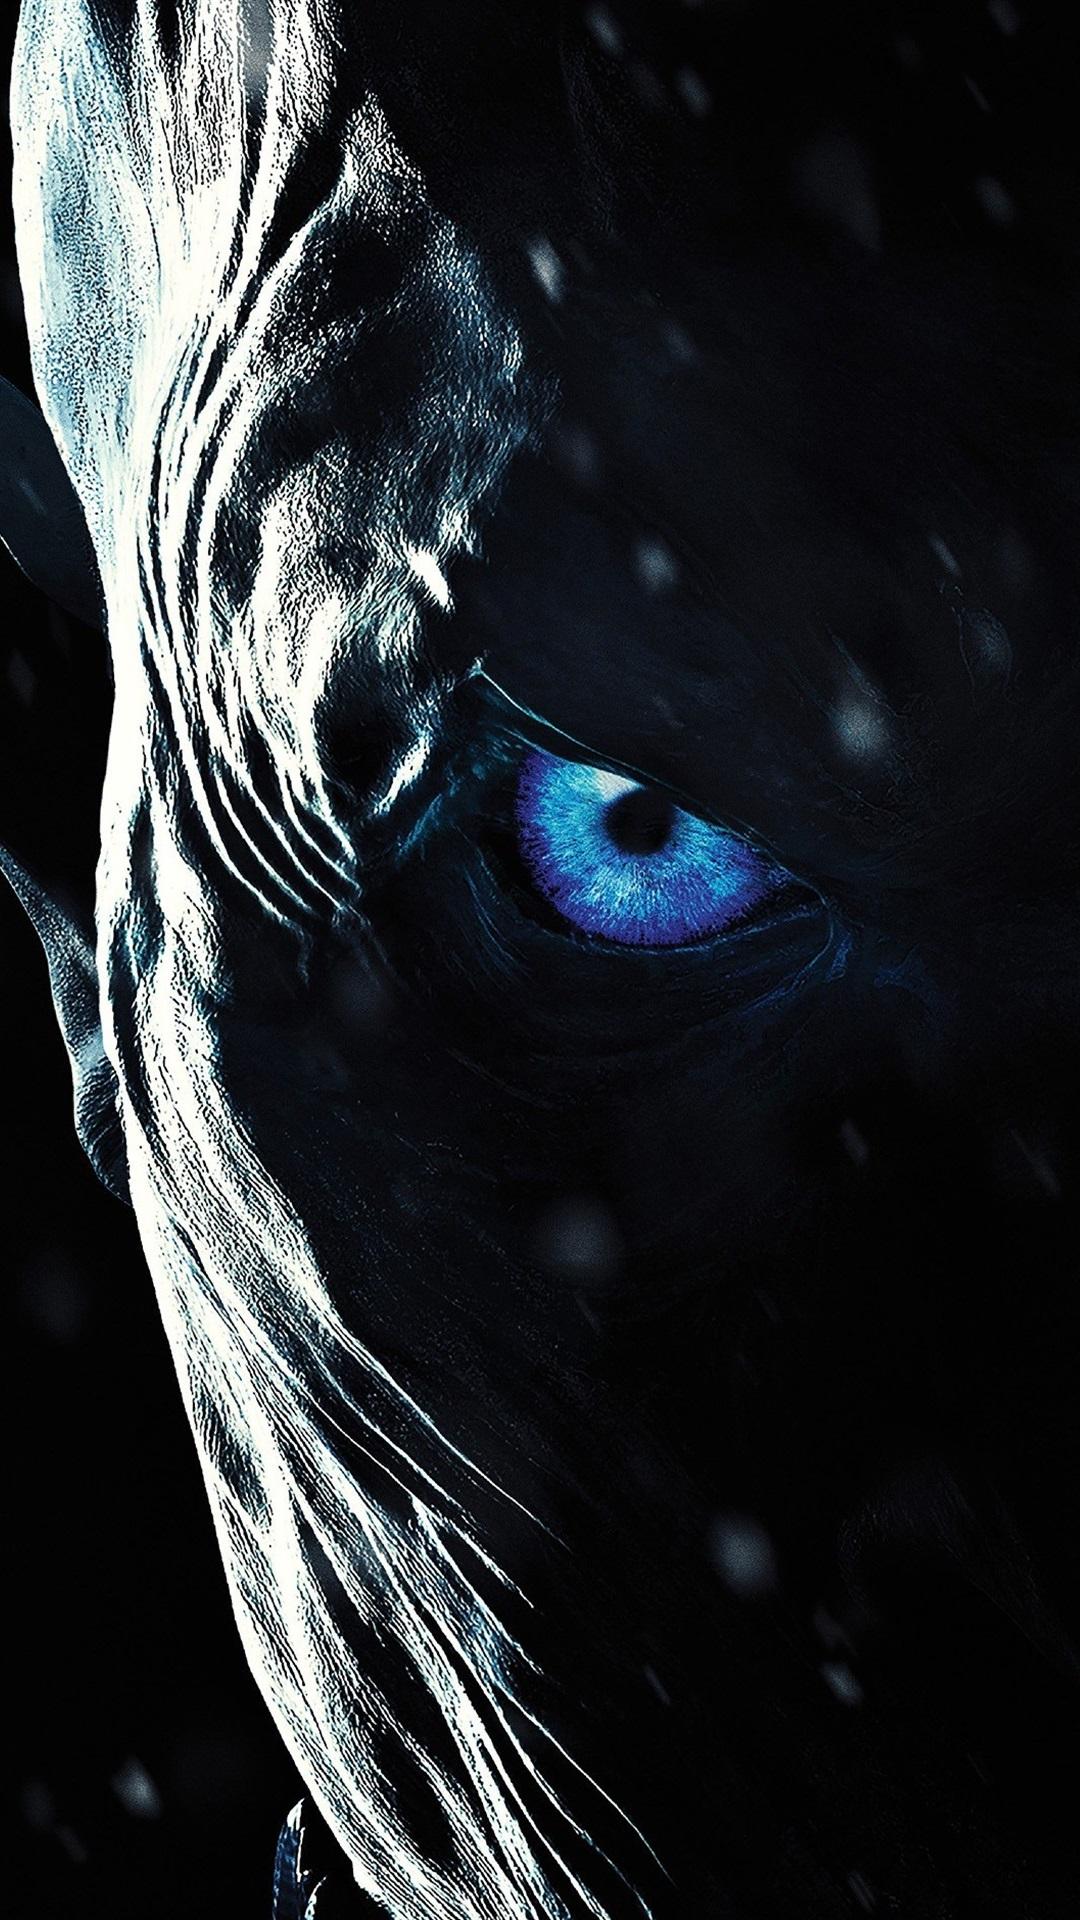 Game of Thrones season 7 1080x1920 iPhone 8766S Plus wallpaper 1080x1920